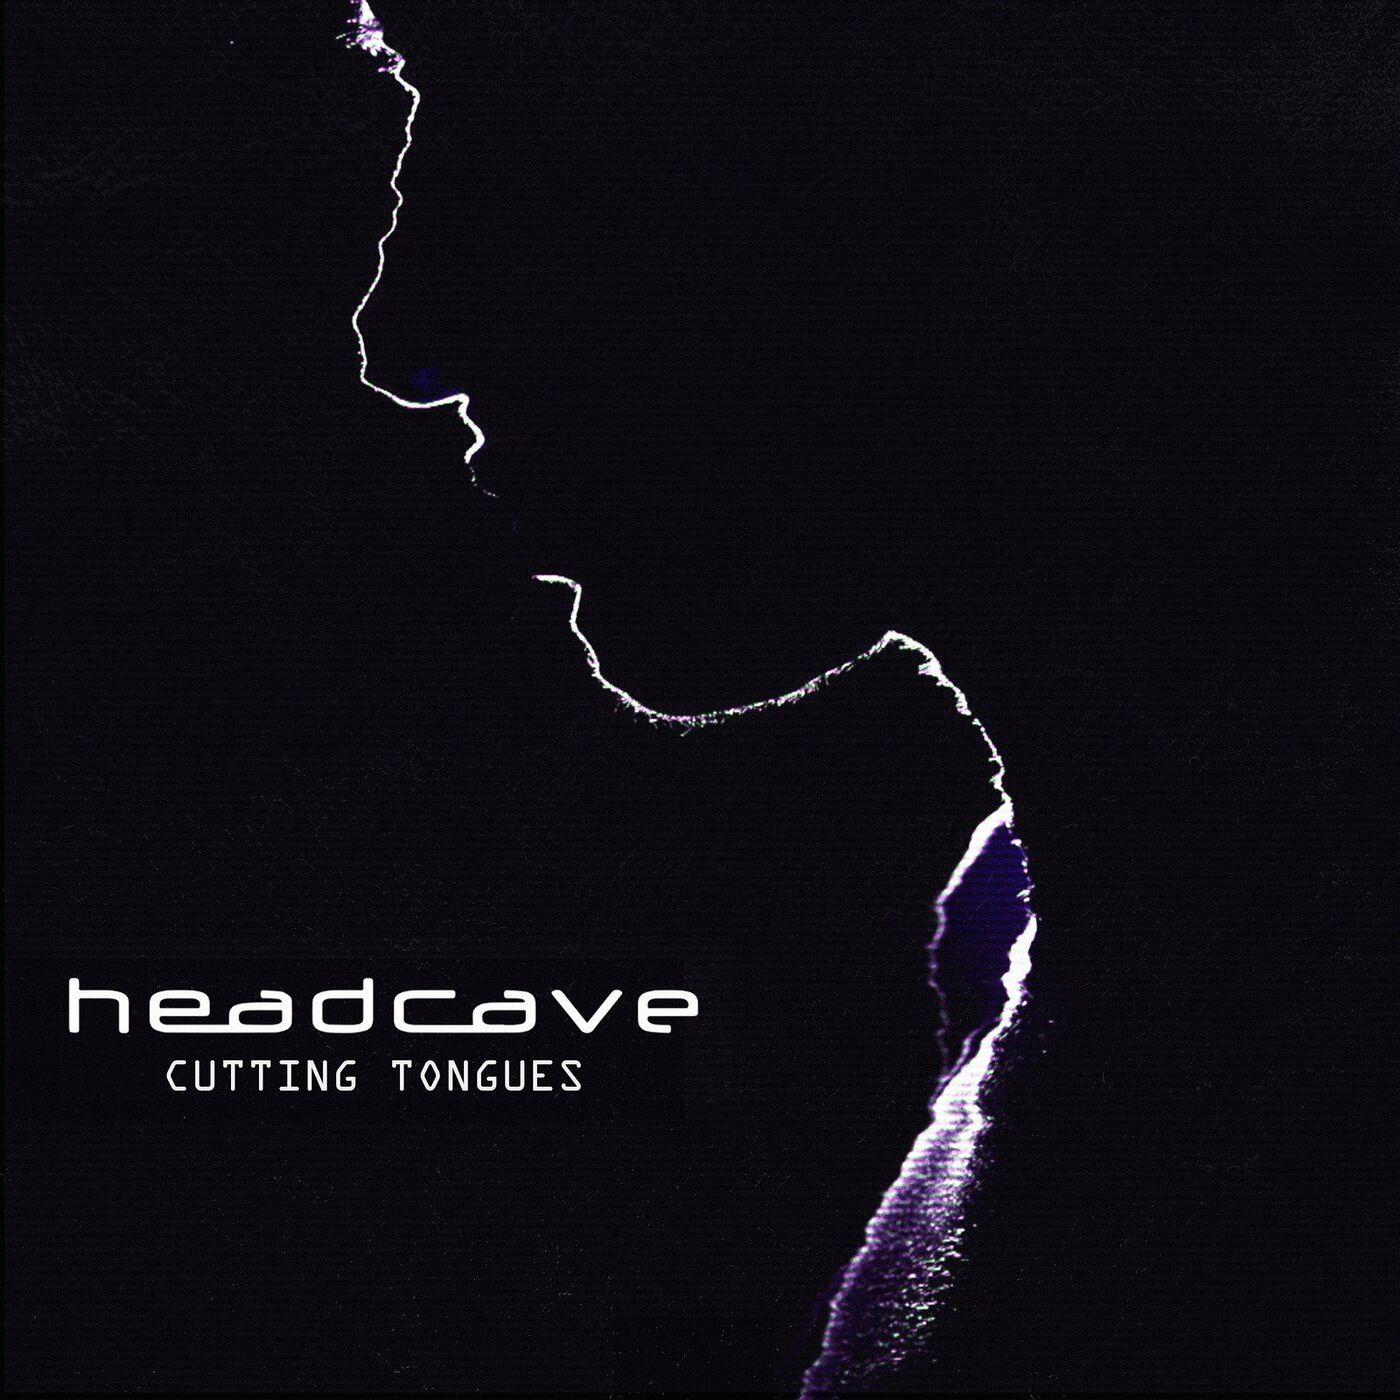 headcave - Cutting Tongues [single] (2021)